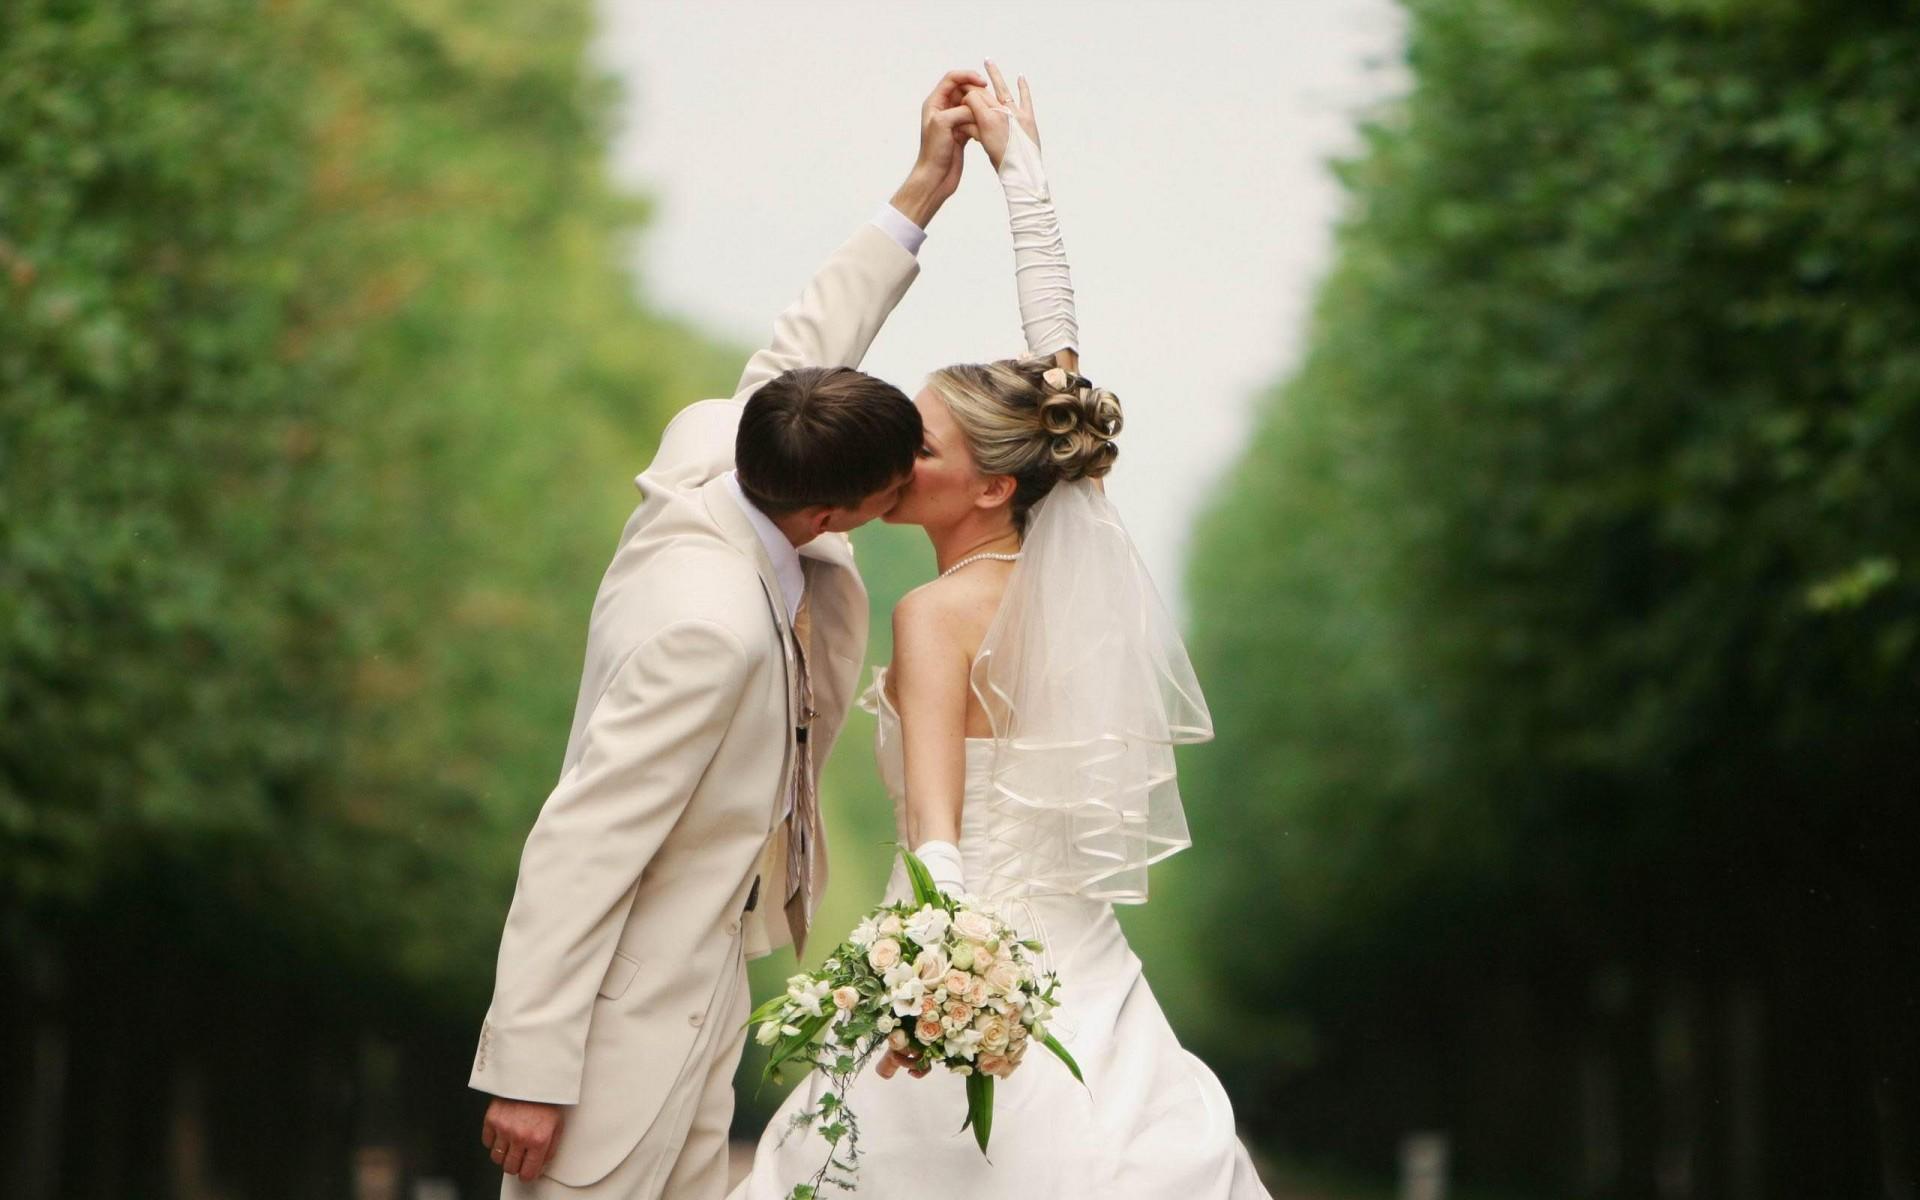 Wedding-Kiss-Photos-2013-HD-Wallpaper.jpg